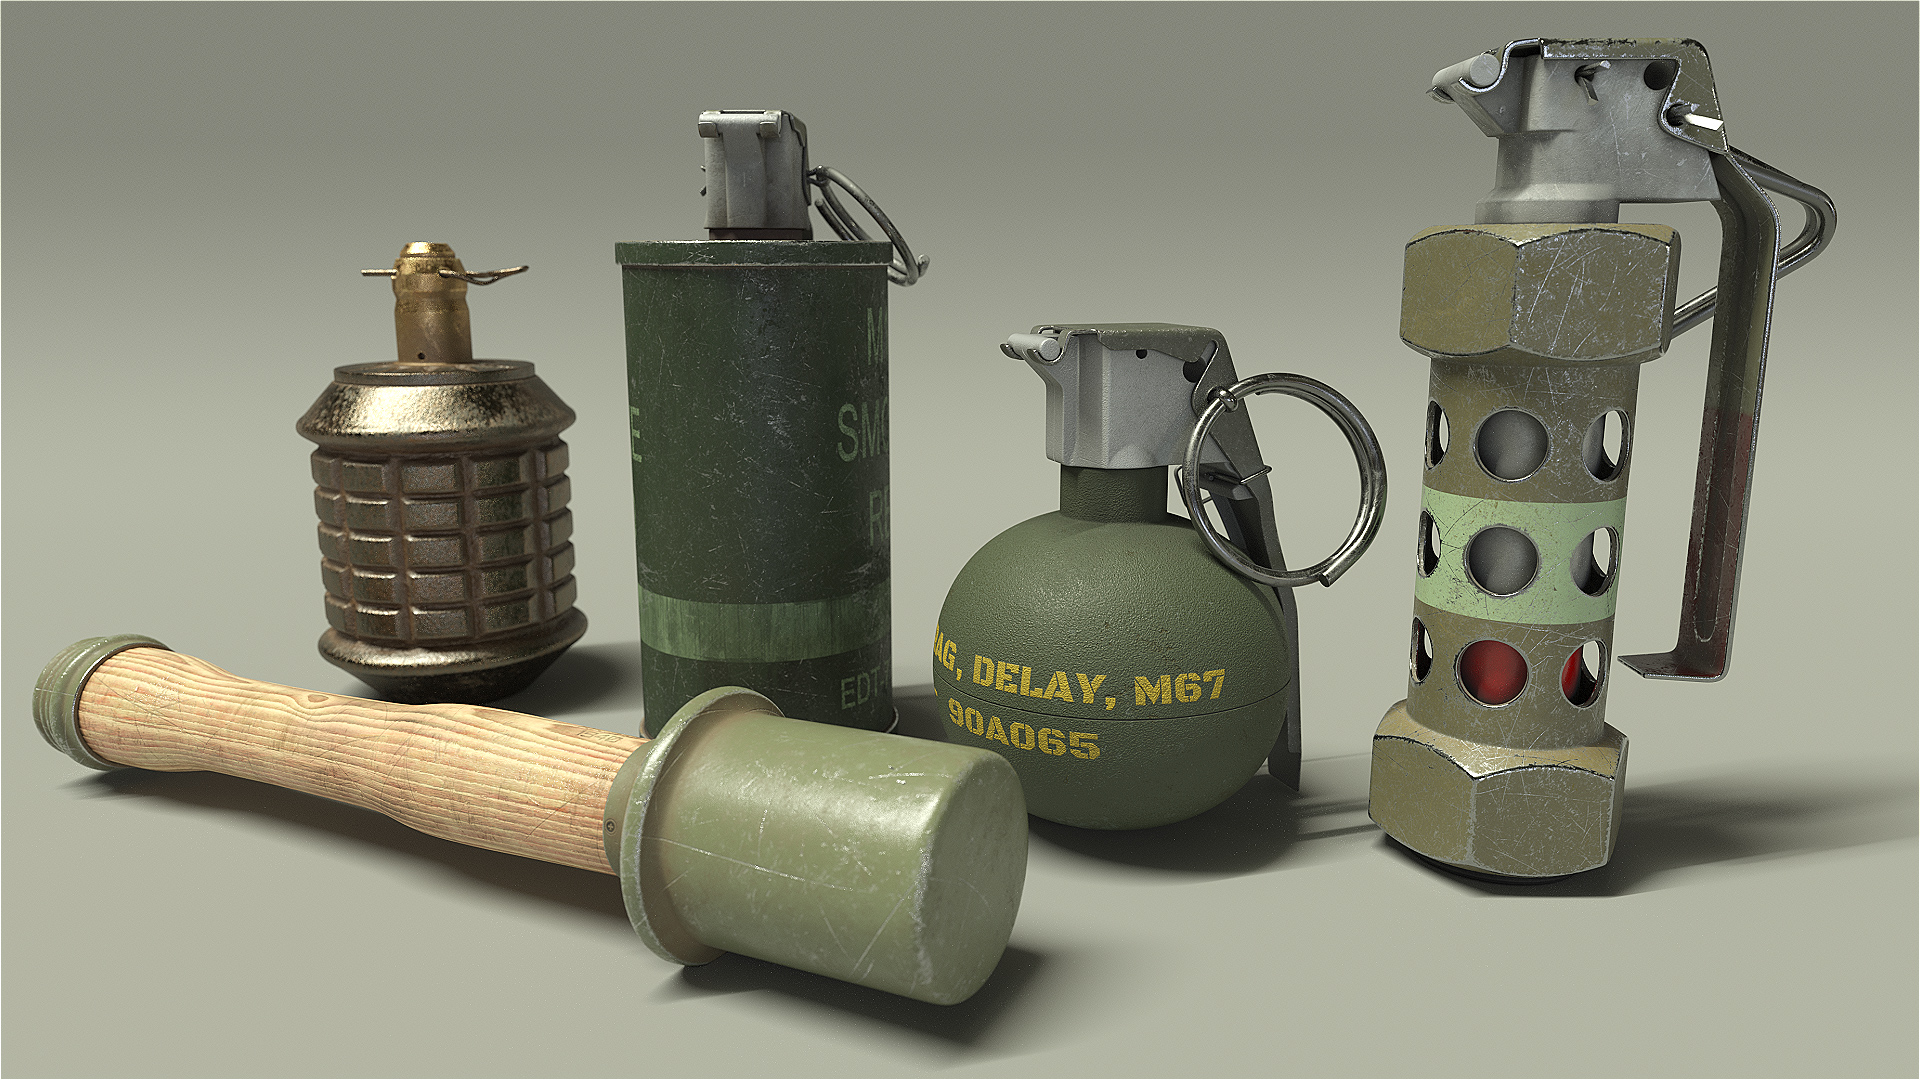 3D Model: Type 97 Grenade HD Render 1